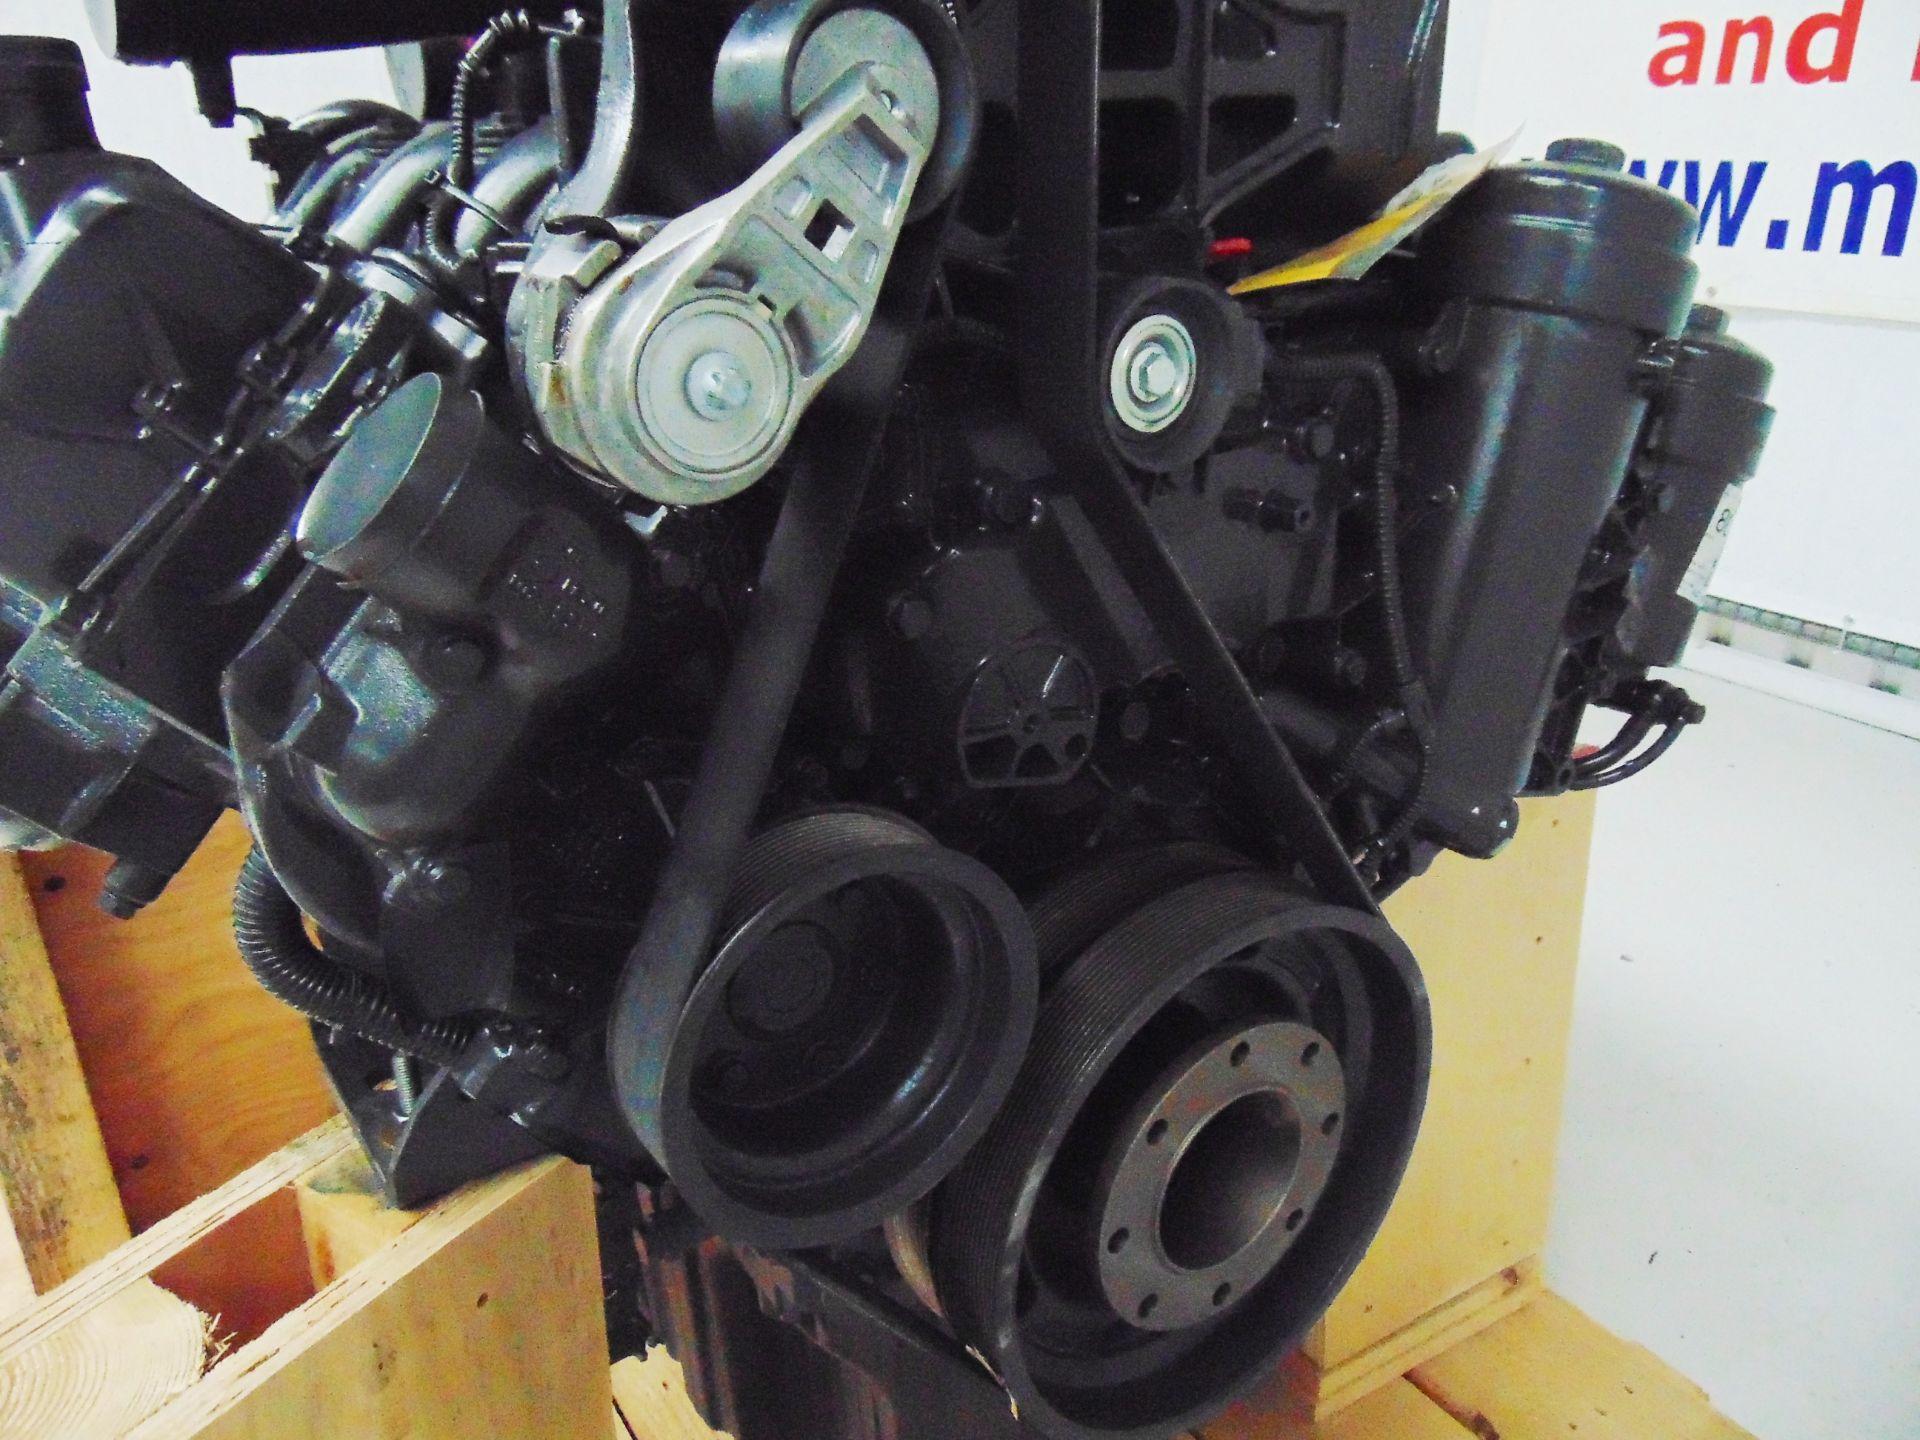 Lot 13 - Factory Reconditioned Mercedes-Benz OM501LA V6 Turbo Diesel Engine